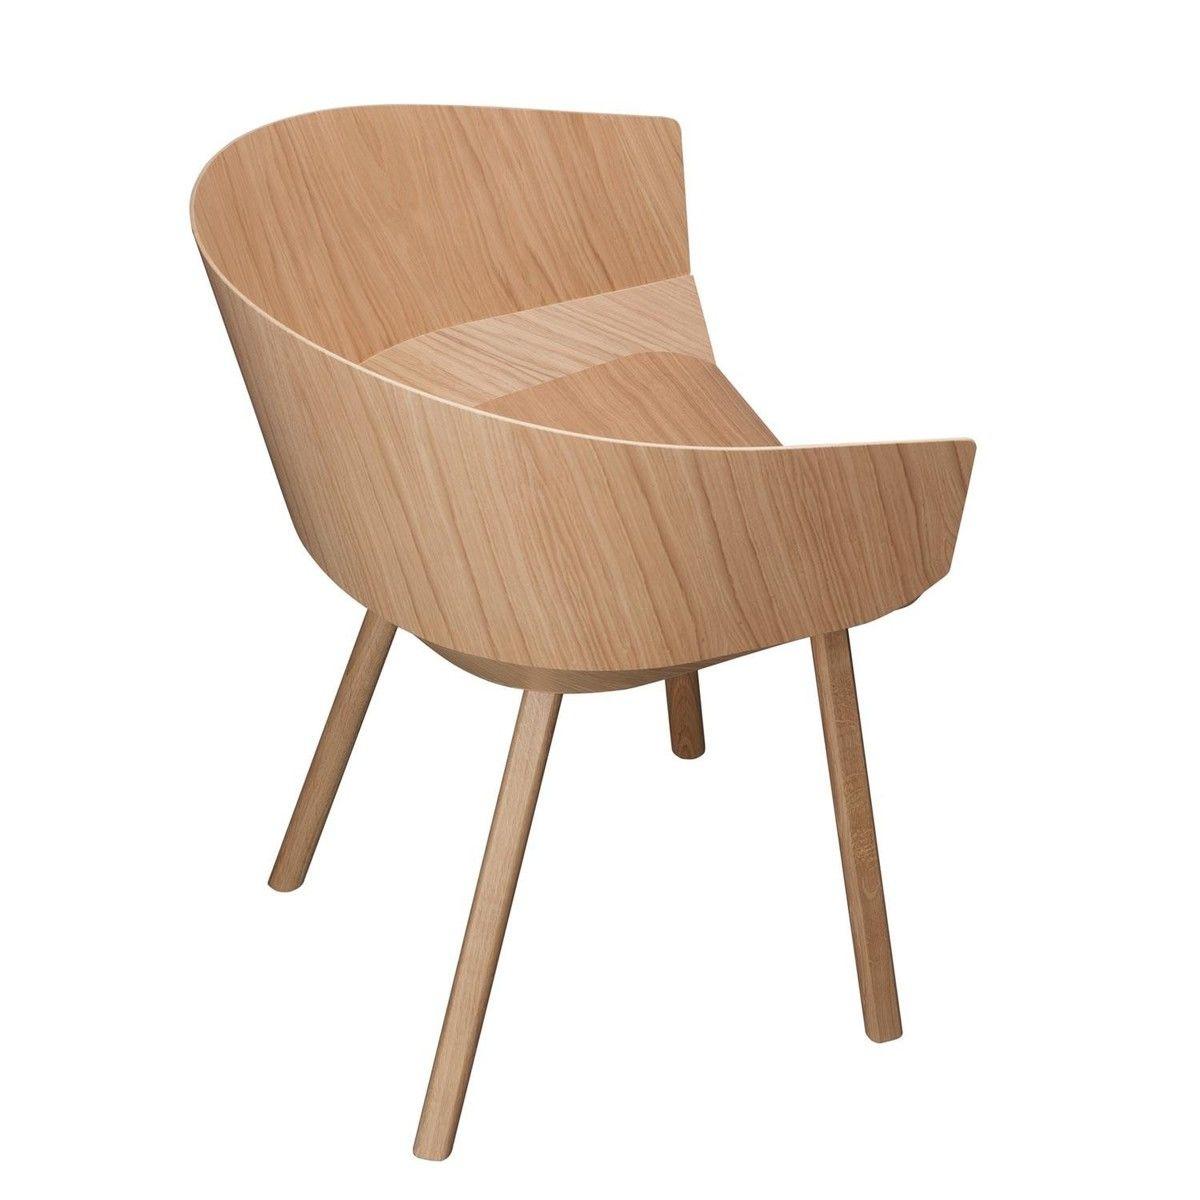 e15 houdini armchair ch04 e15. Black Bedroom Furniture Sets. Home Design Ideas